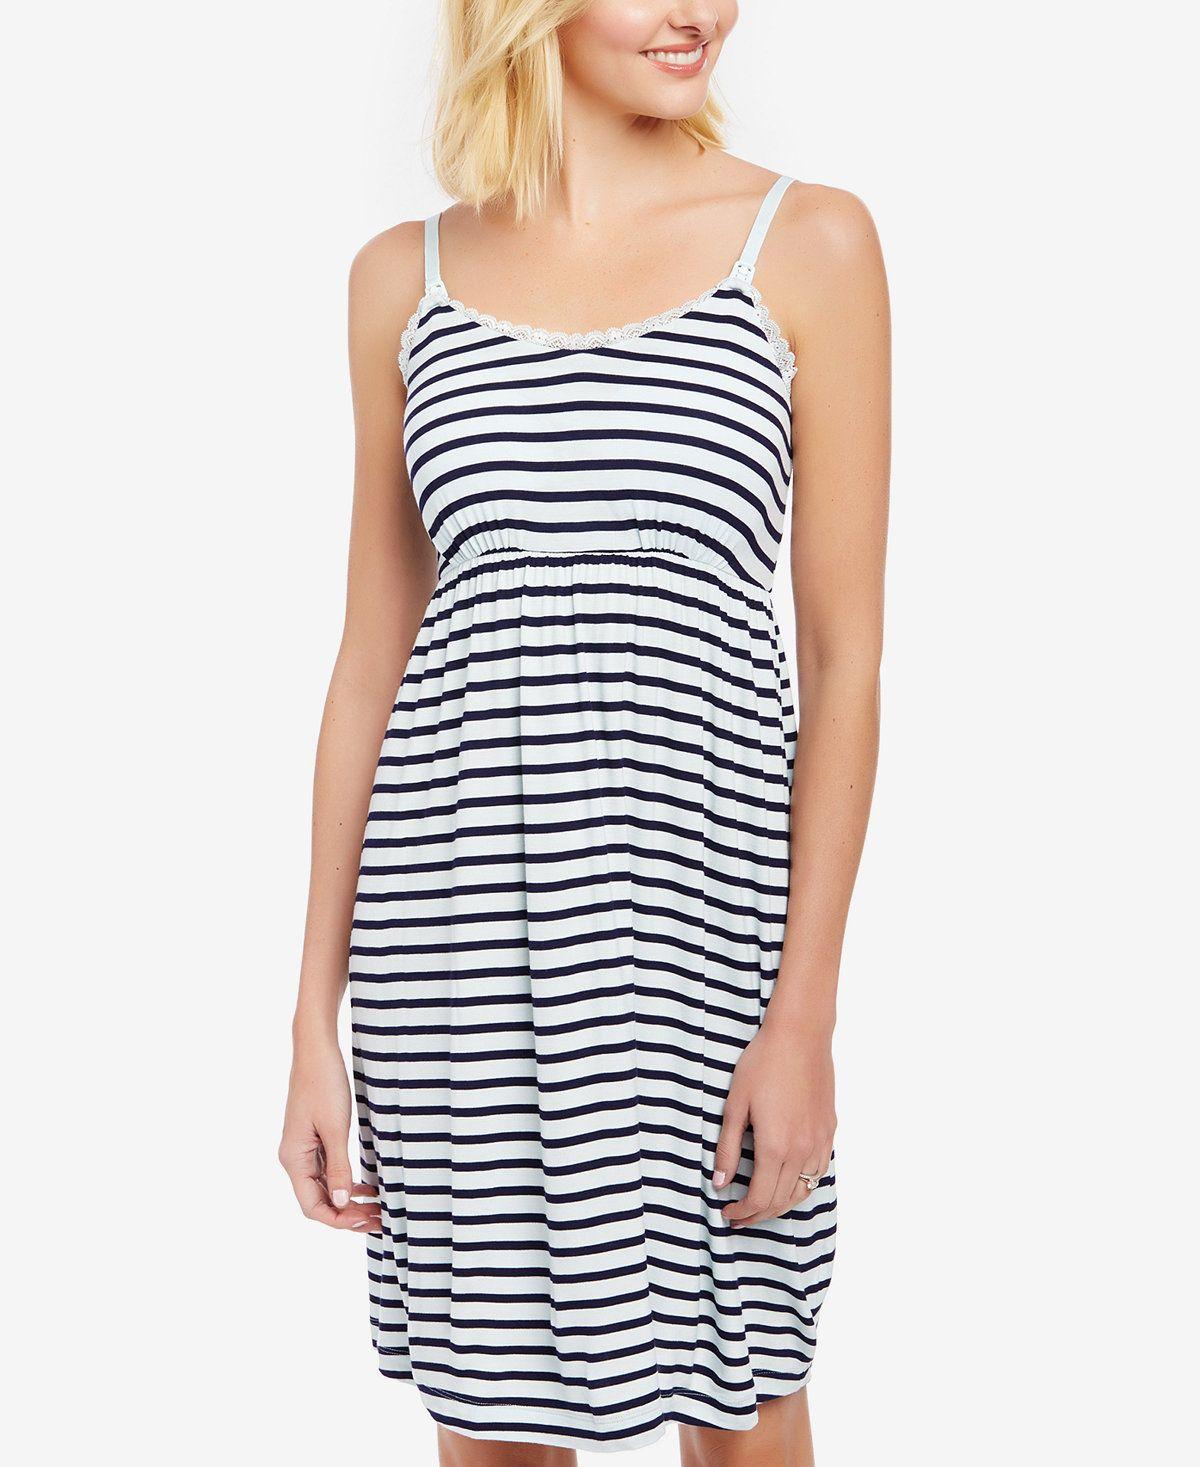 4f8650279fb71 Motherhood Maternity Babydoll Clip-Down Nursing Nightgown - Maternity -  Women - Macy's